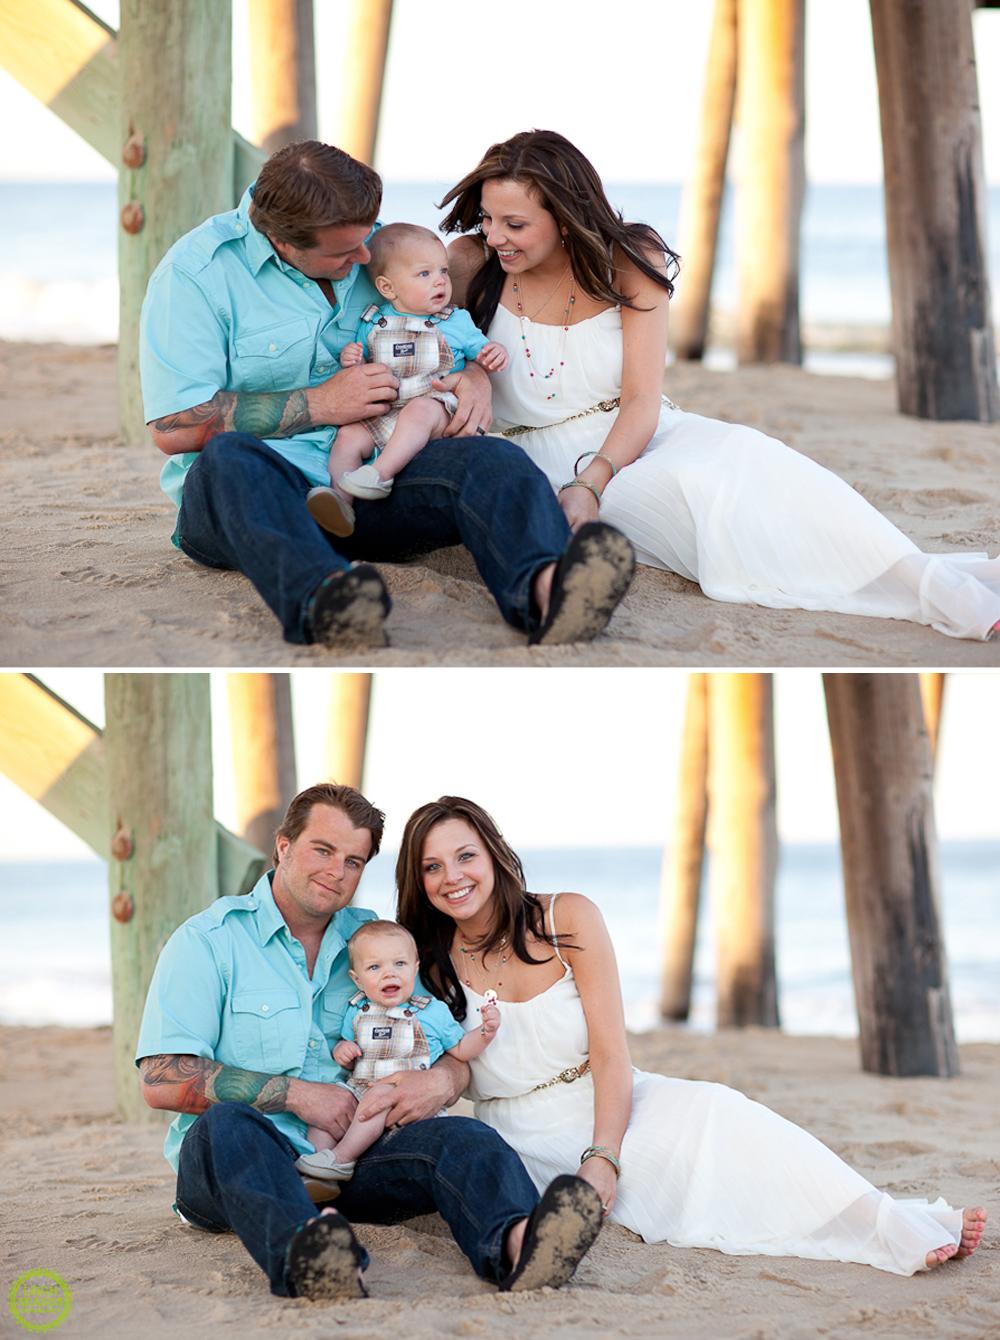 Virginia Beach Family Portrait Photographer ~The Mills Family Portraits~